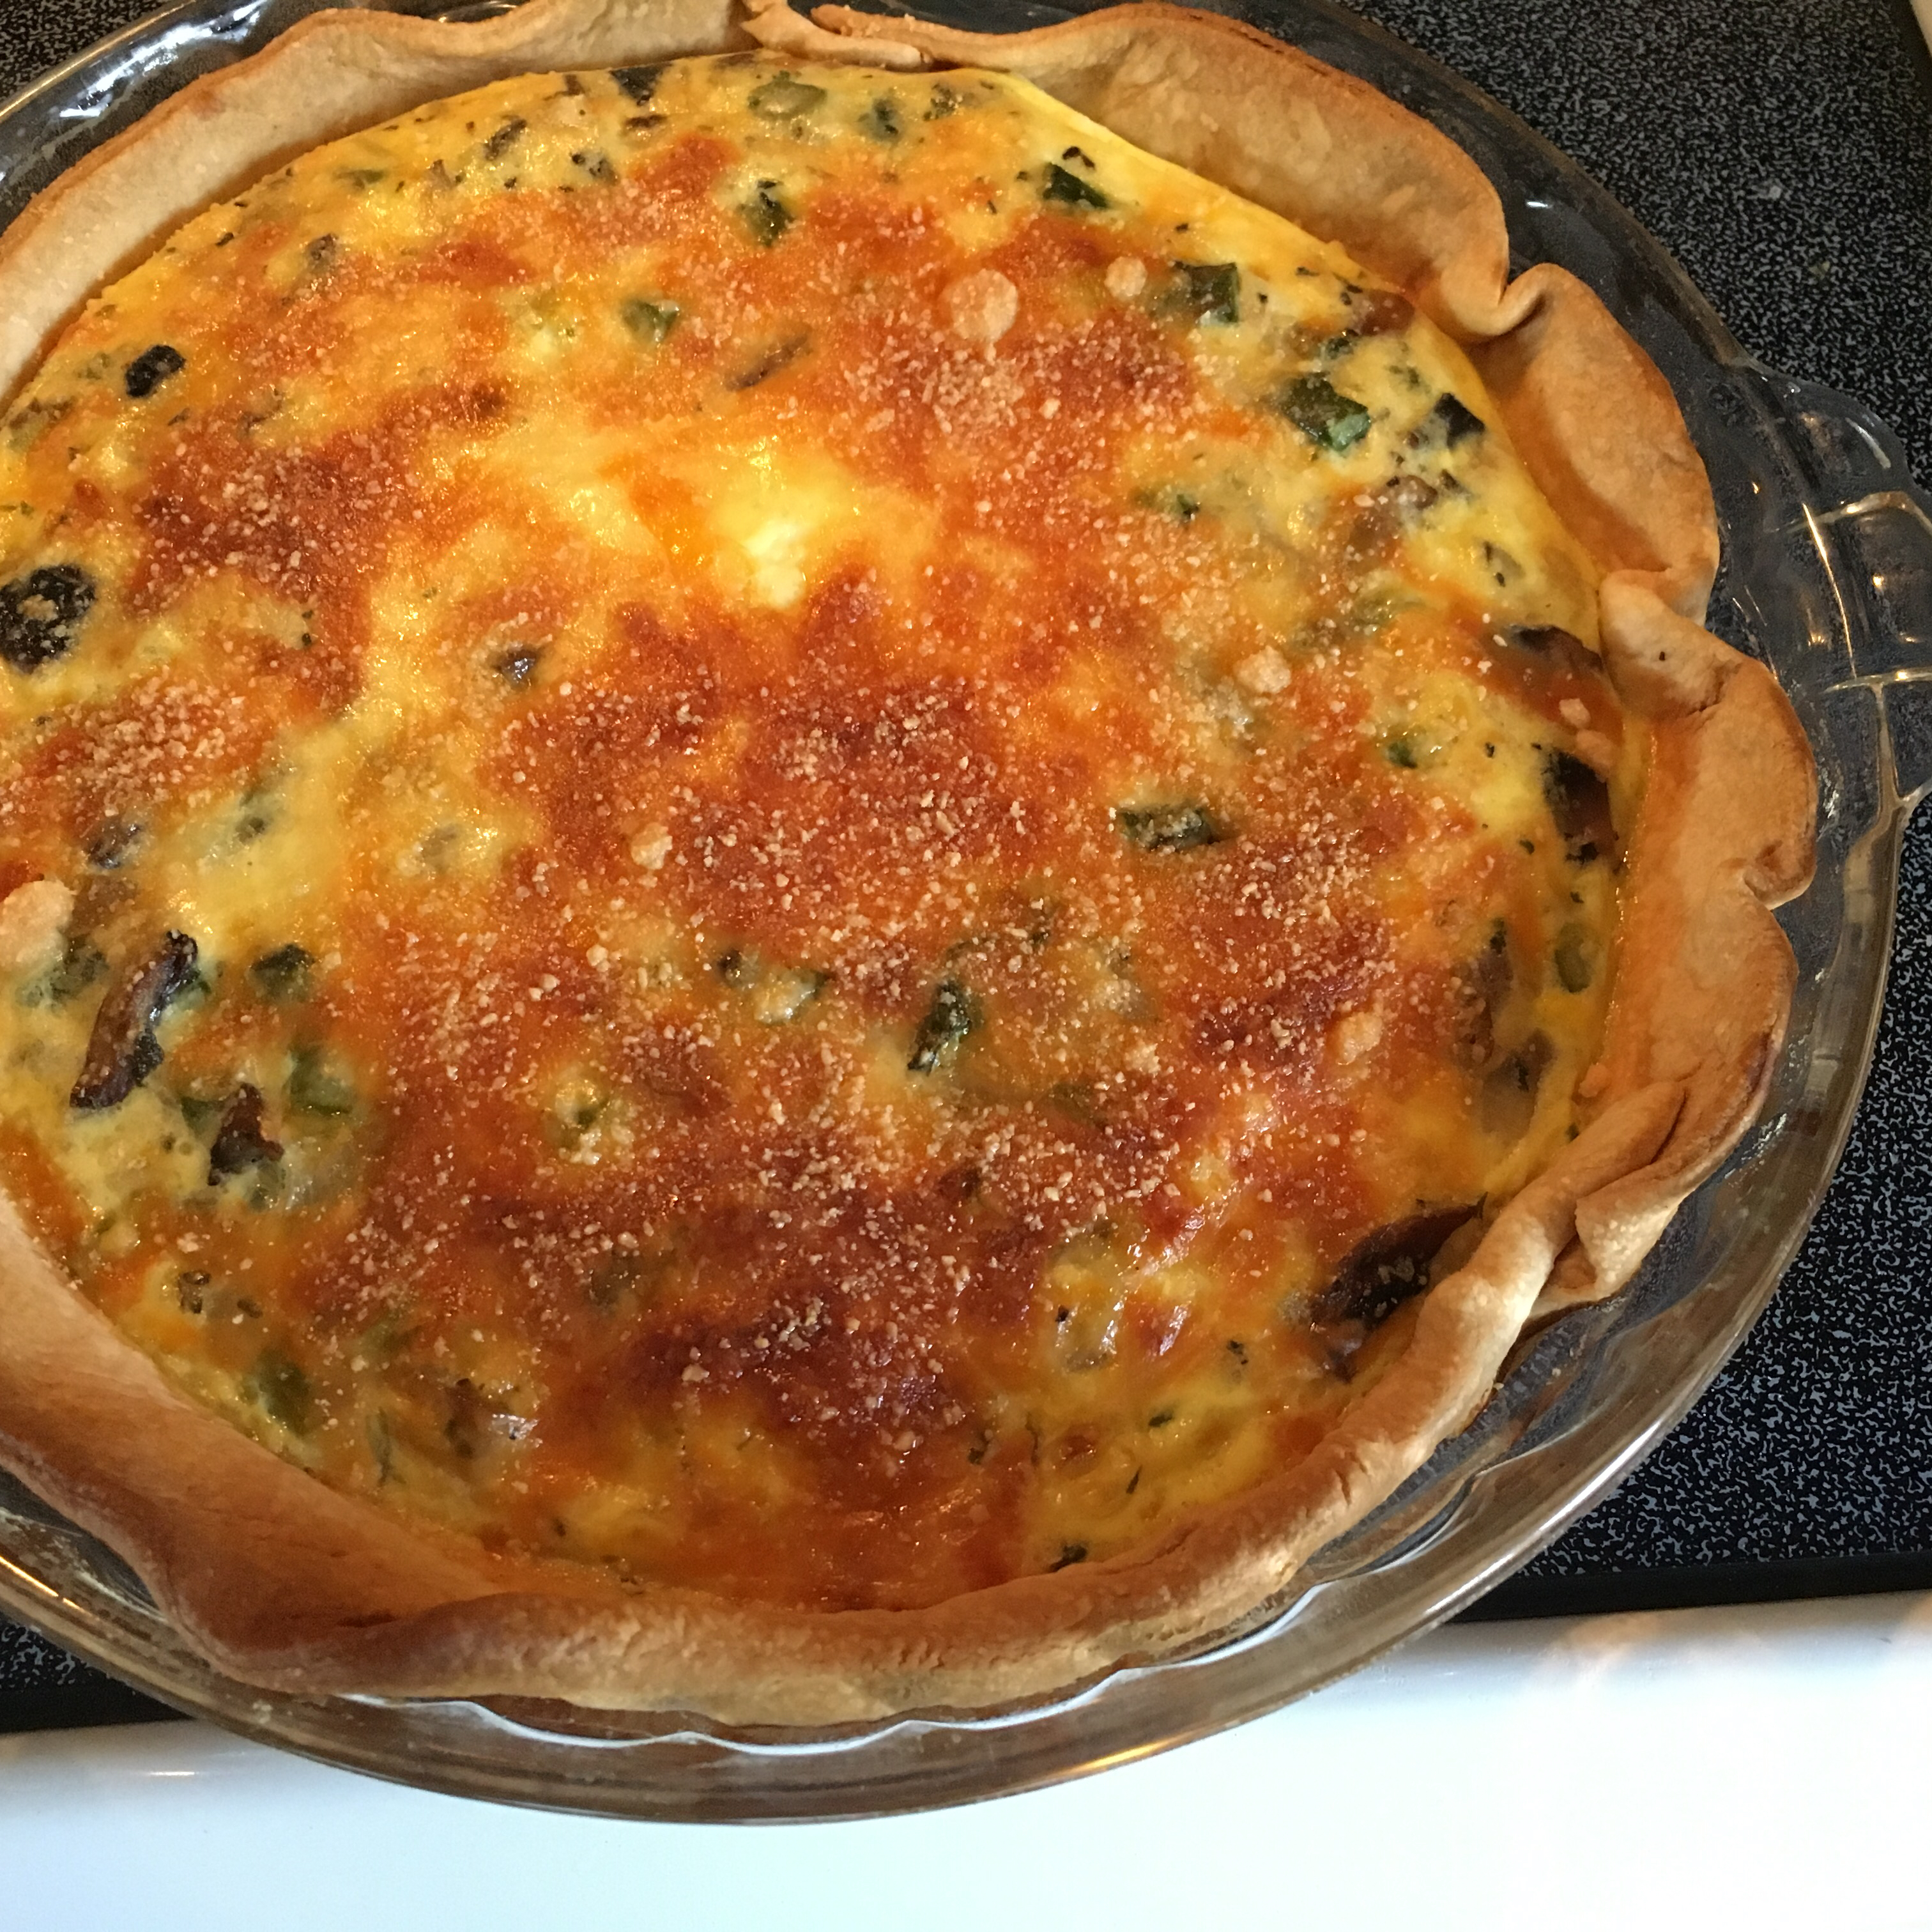 Asparagus and Mushroom Quiche